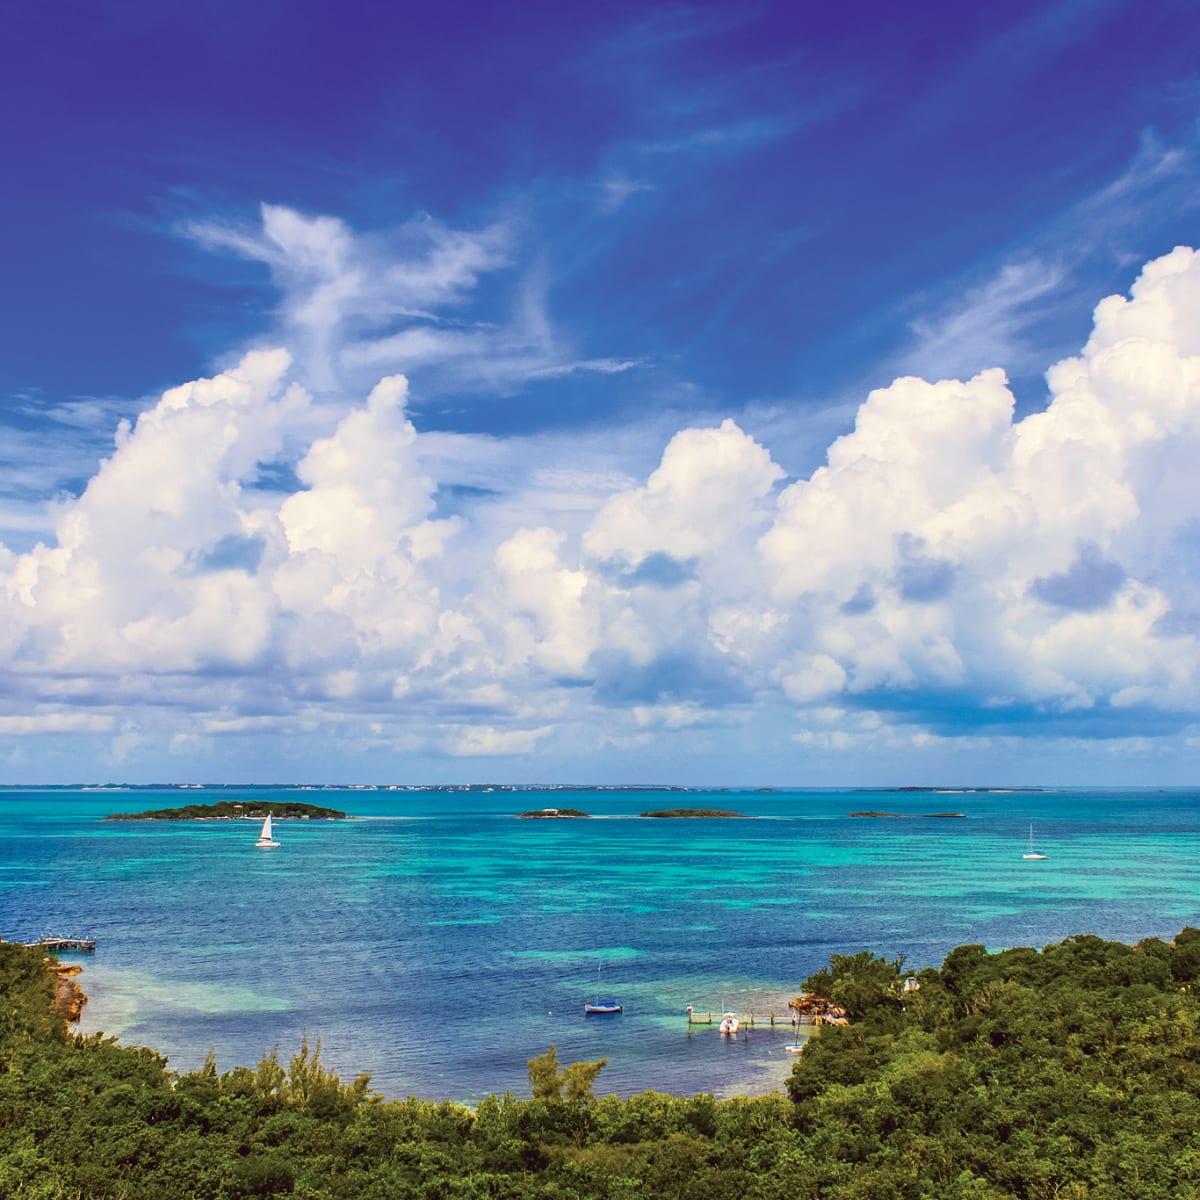 btc bahamos katalogas